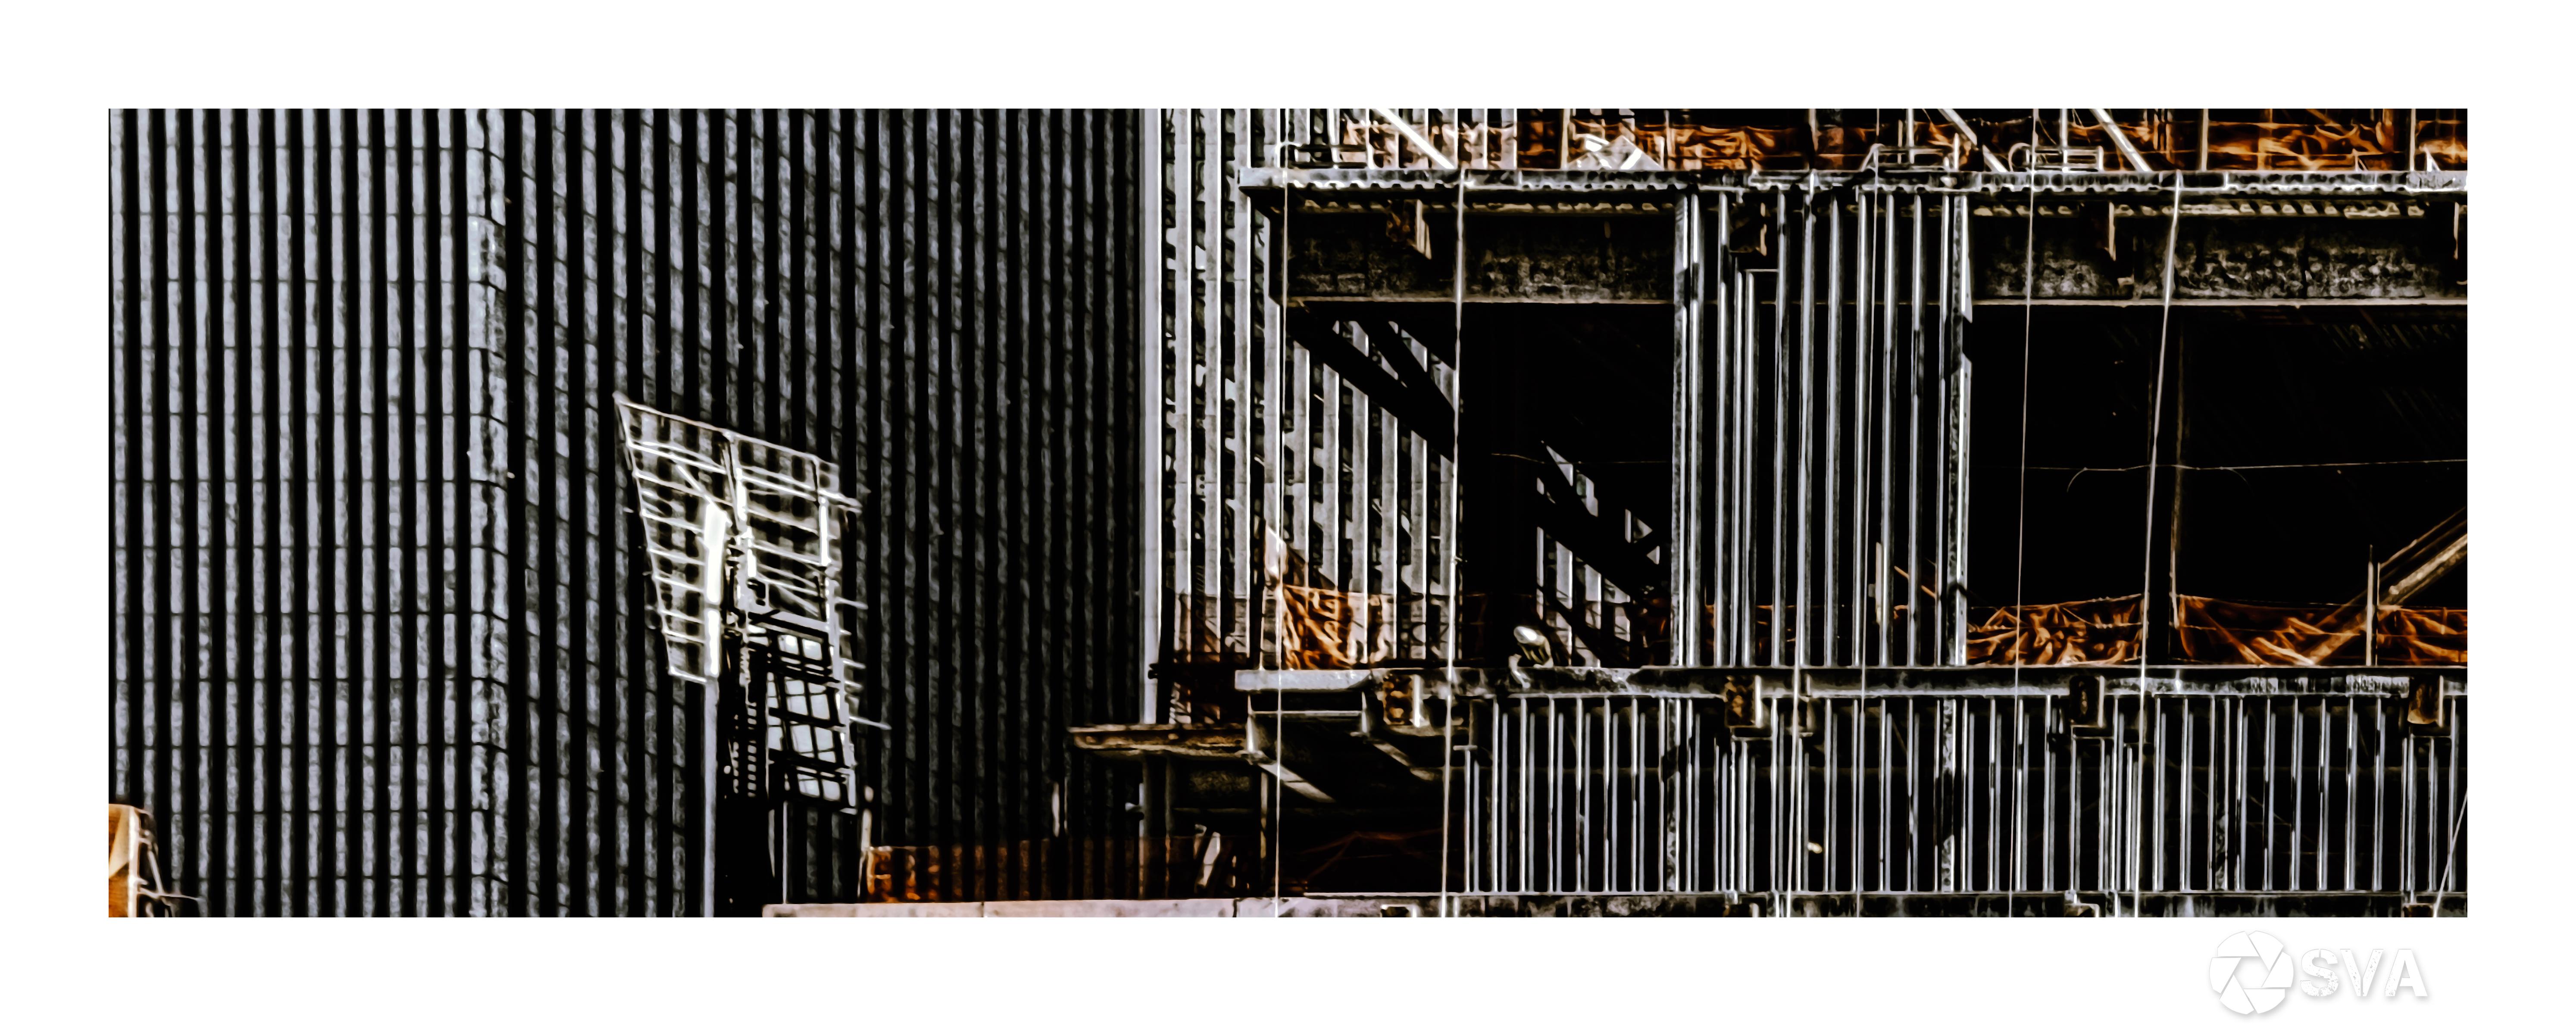 WDILNY_Day 1_Architecture copy